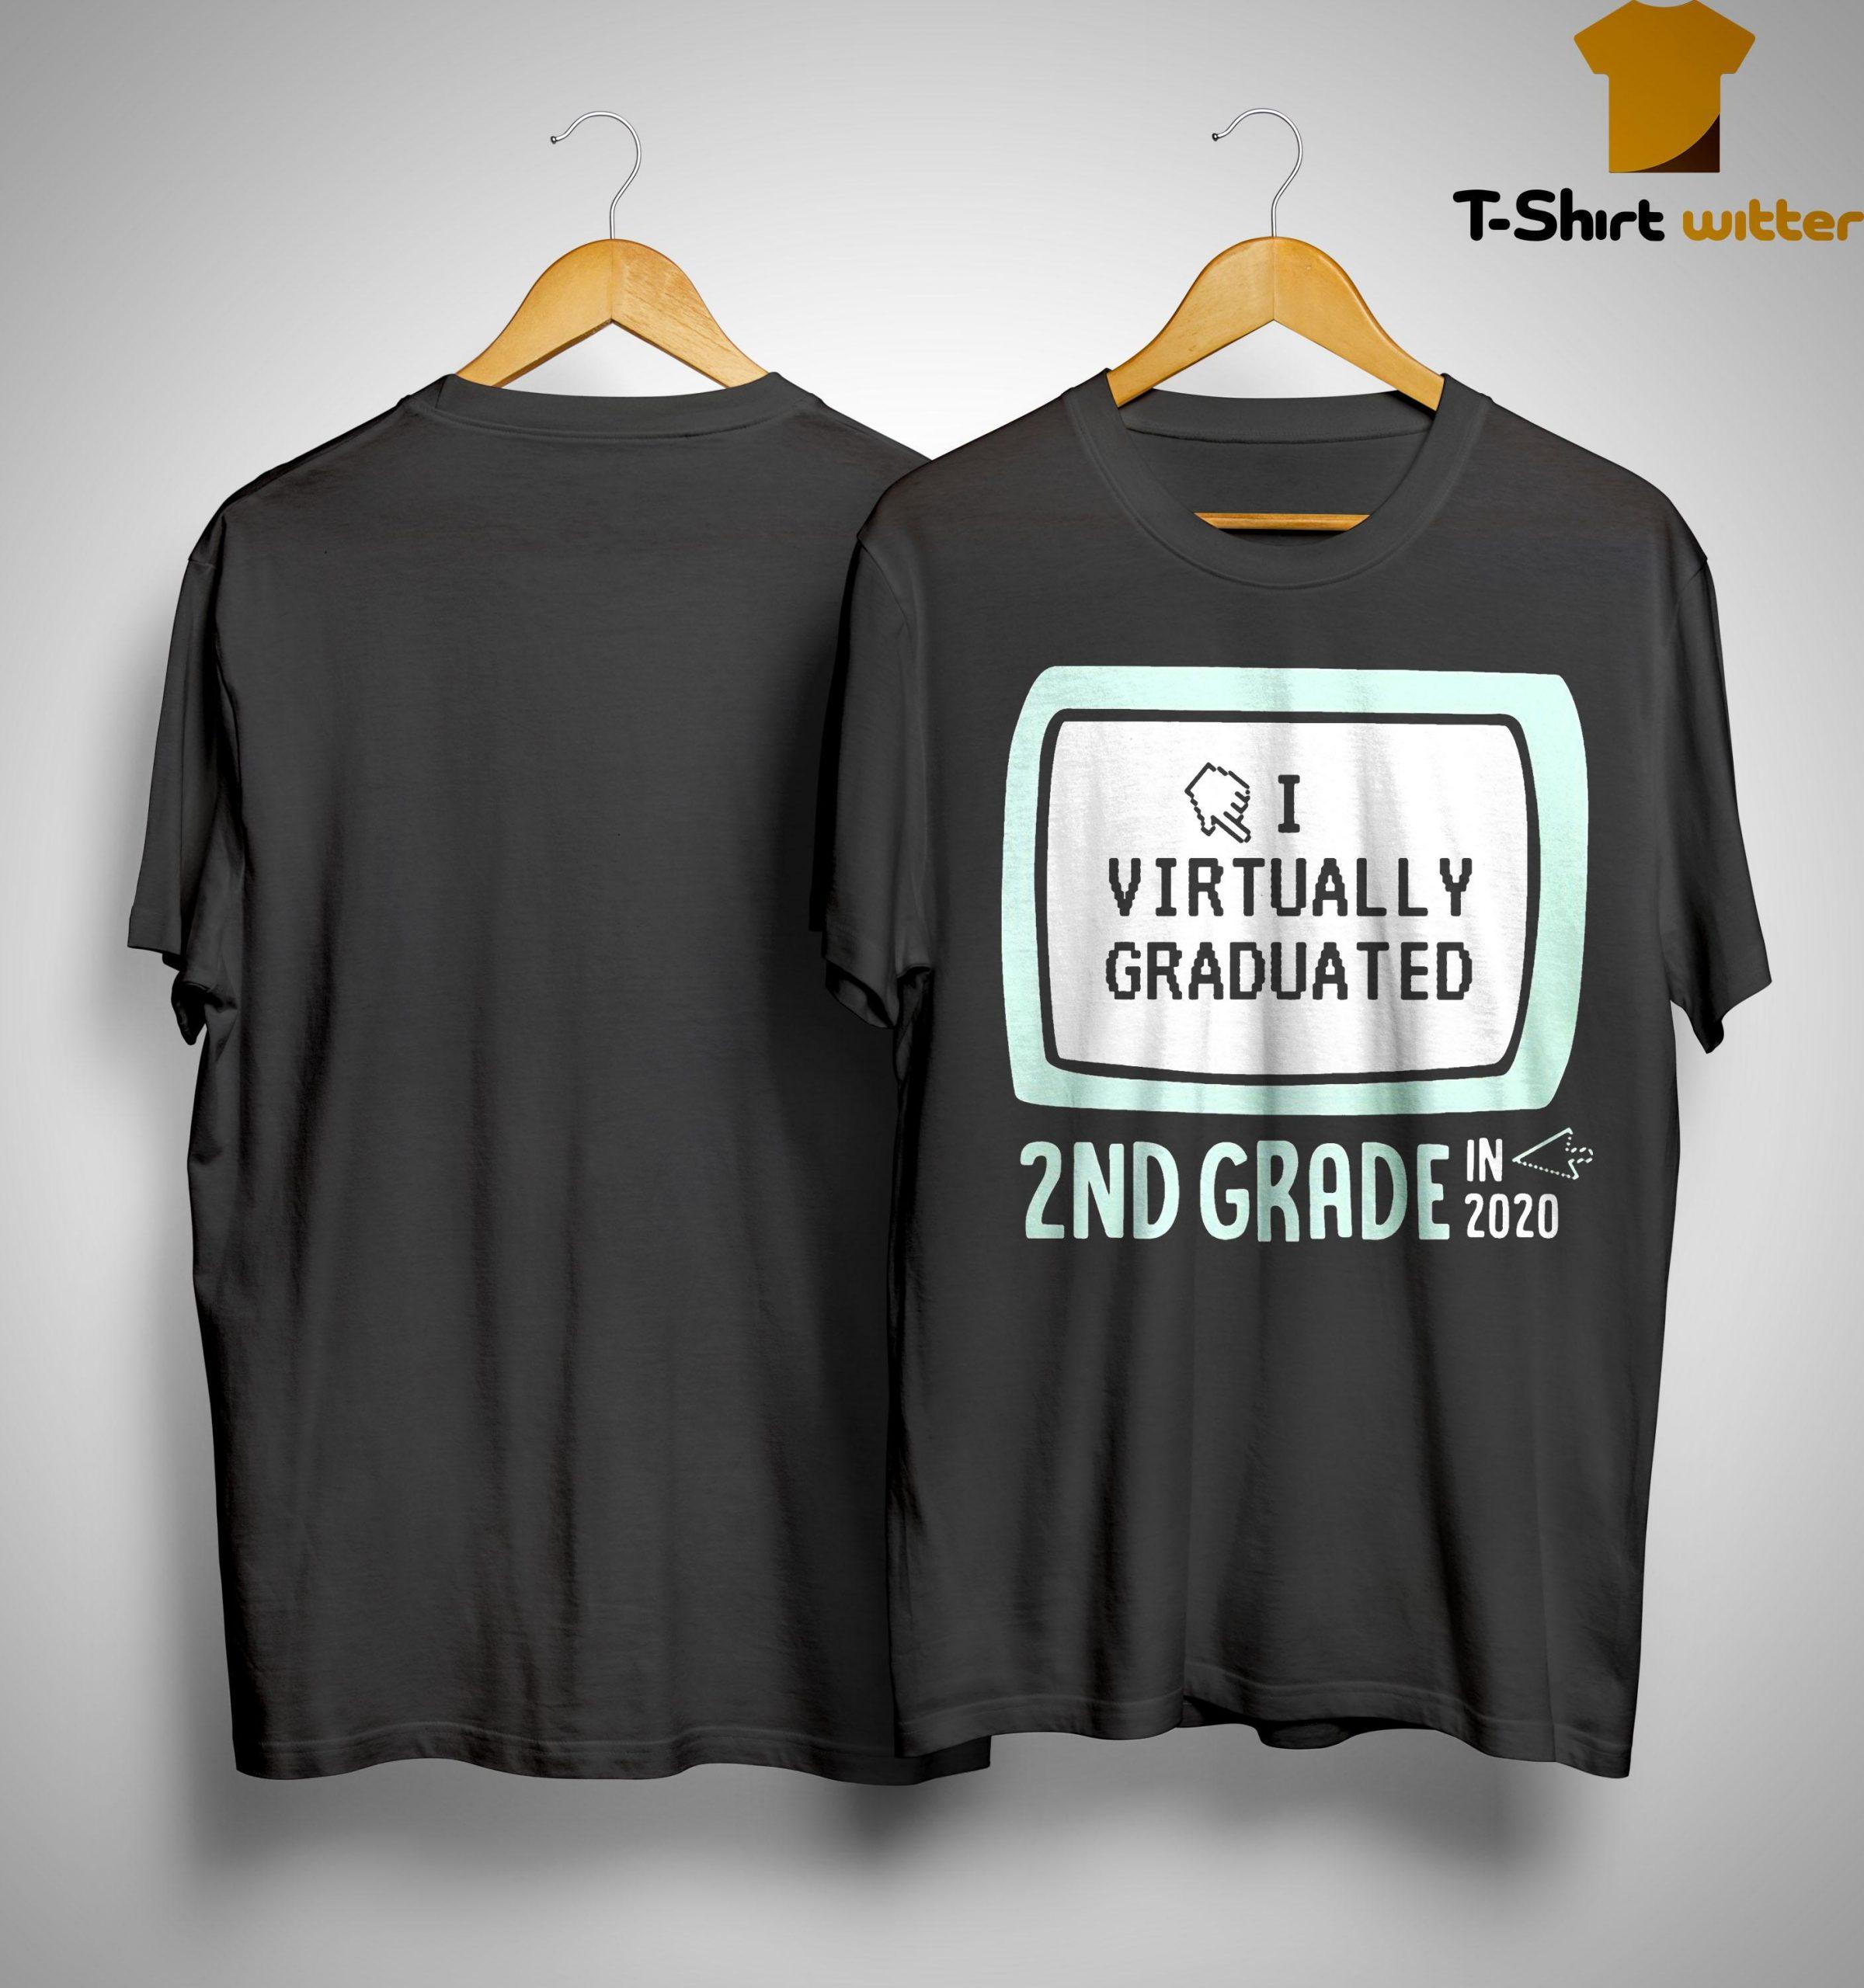 I Virtually Graduated 2nd Grade In 2020 Shirt